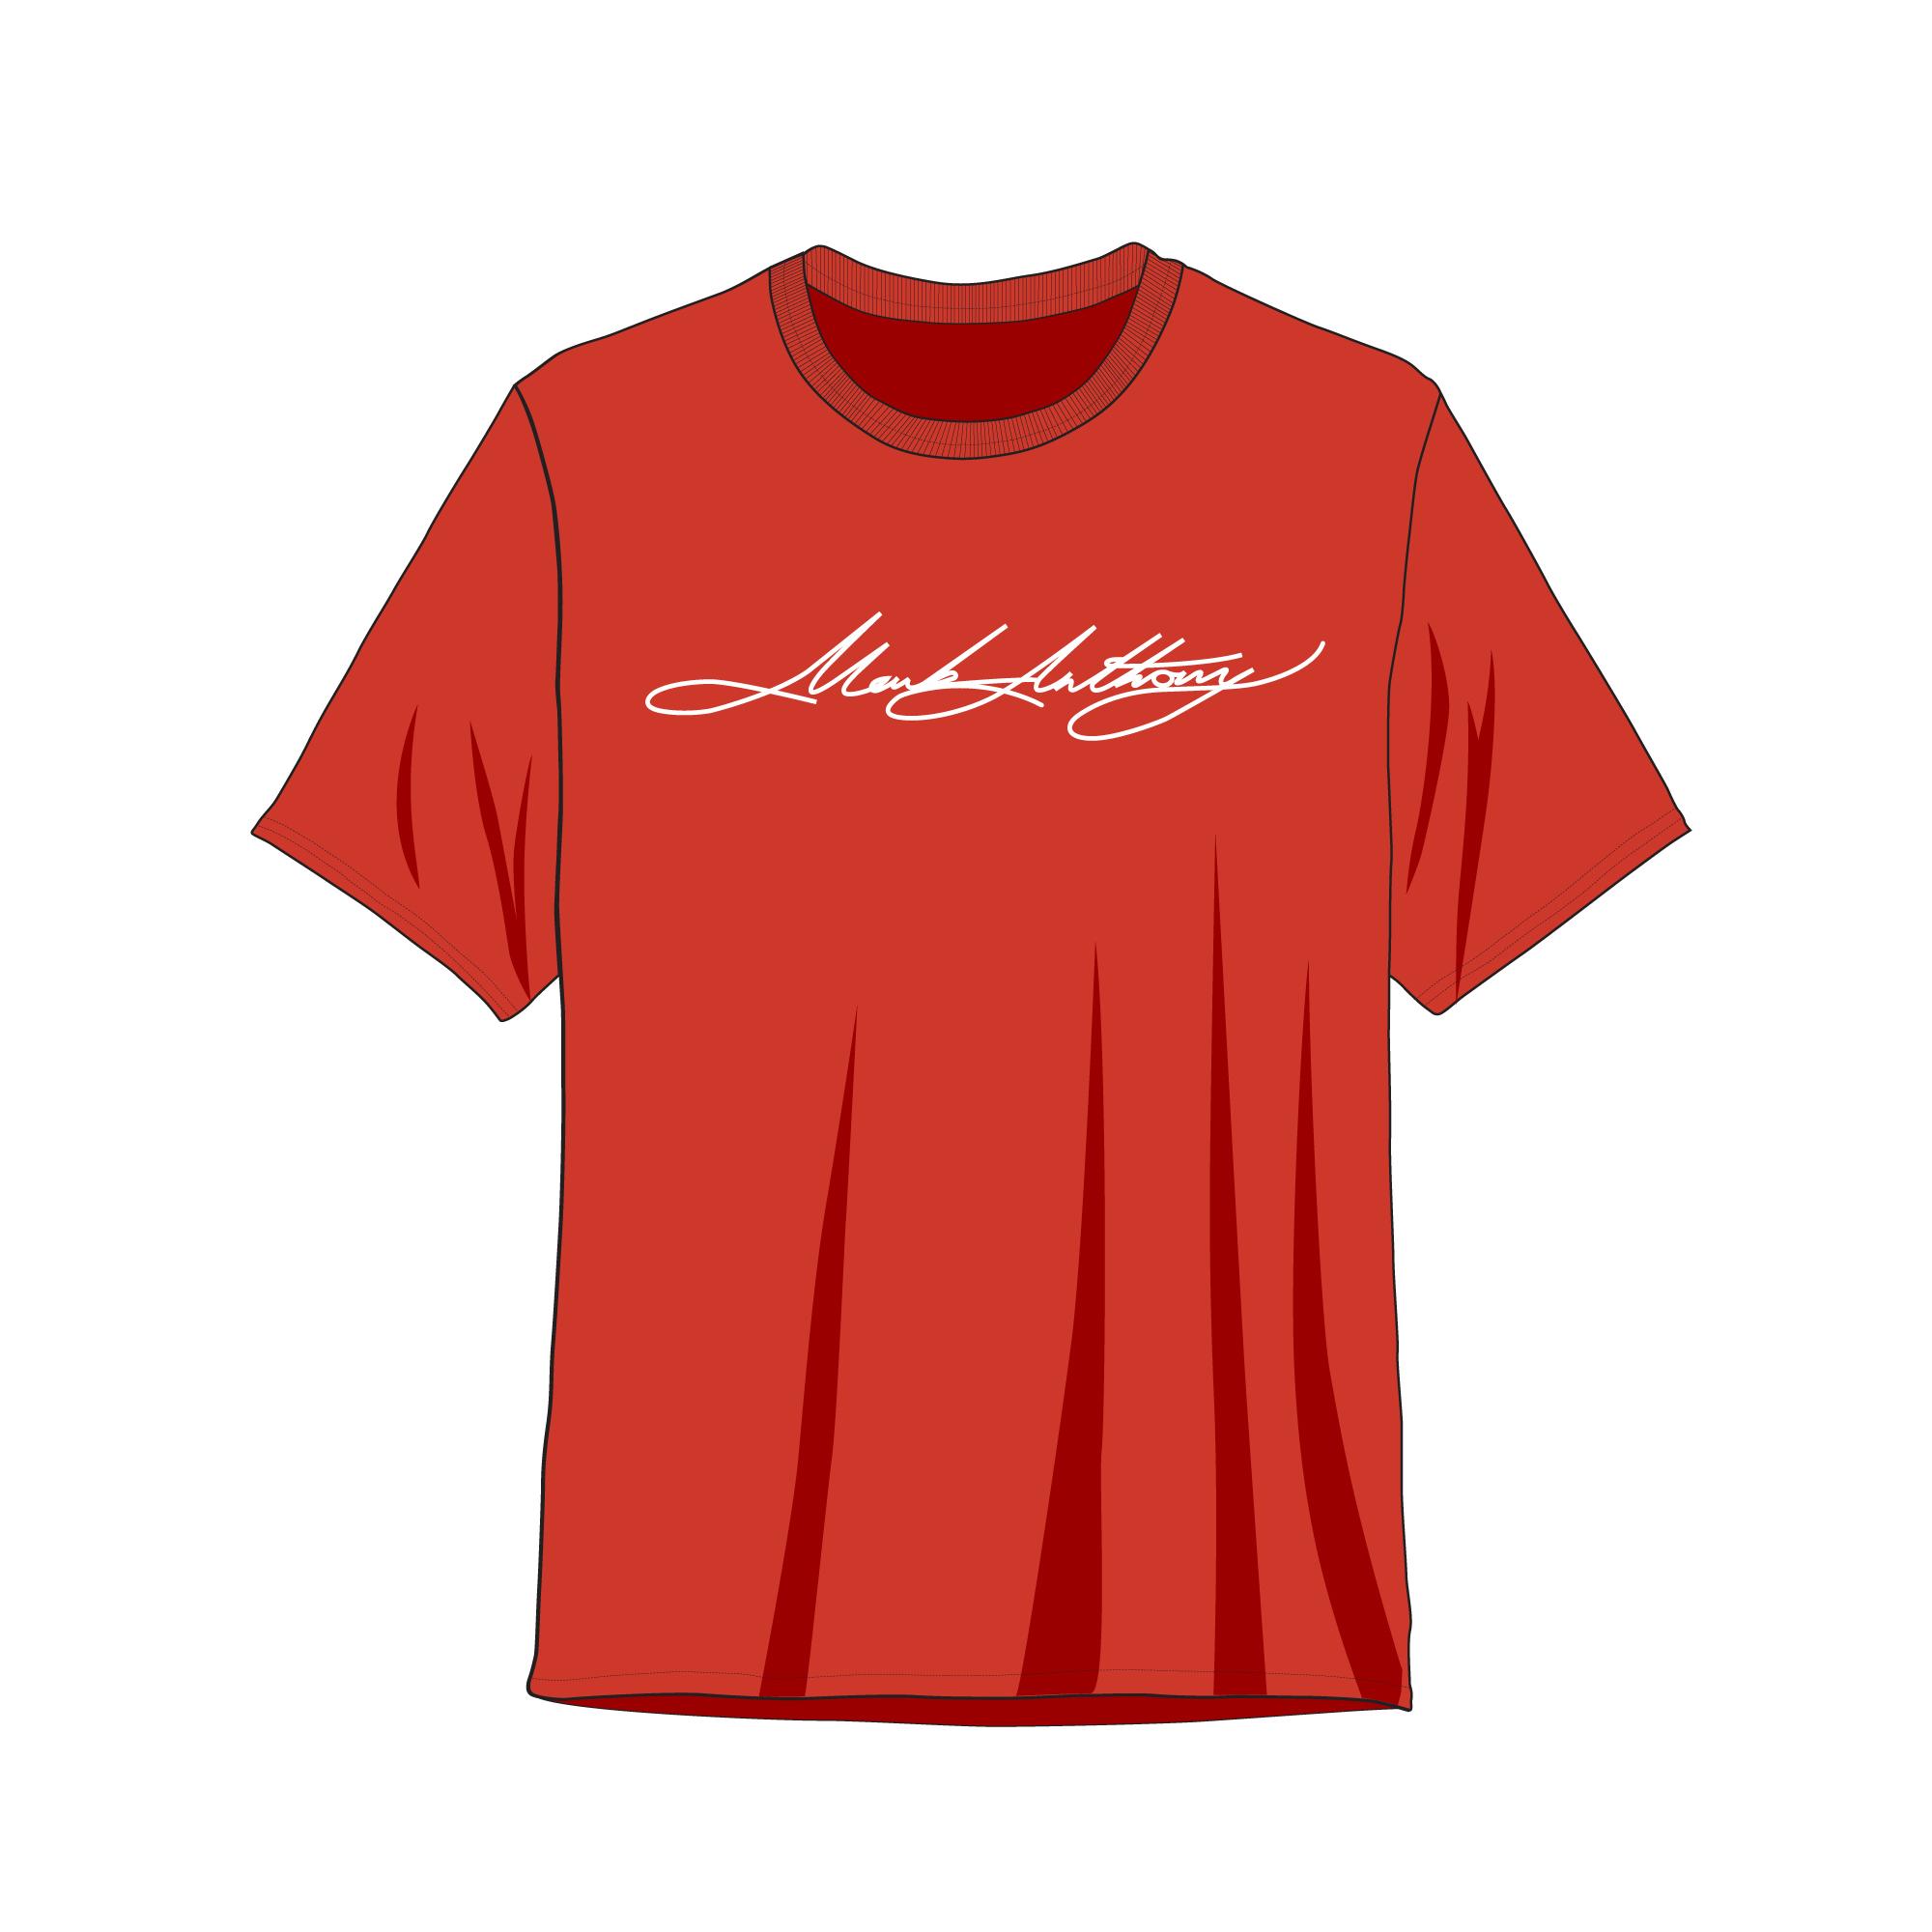 MAM T-Shirts V-Neck Shirts Mockup Template